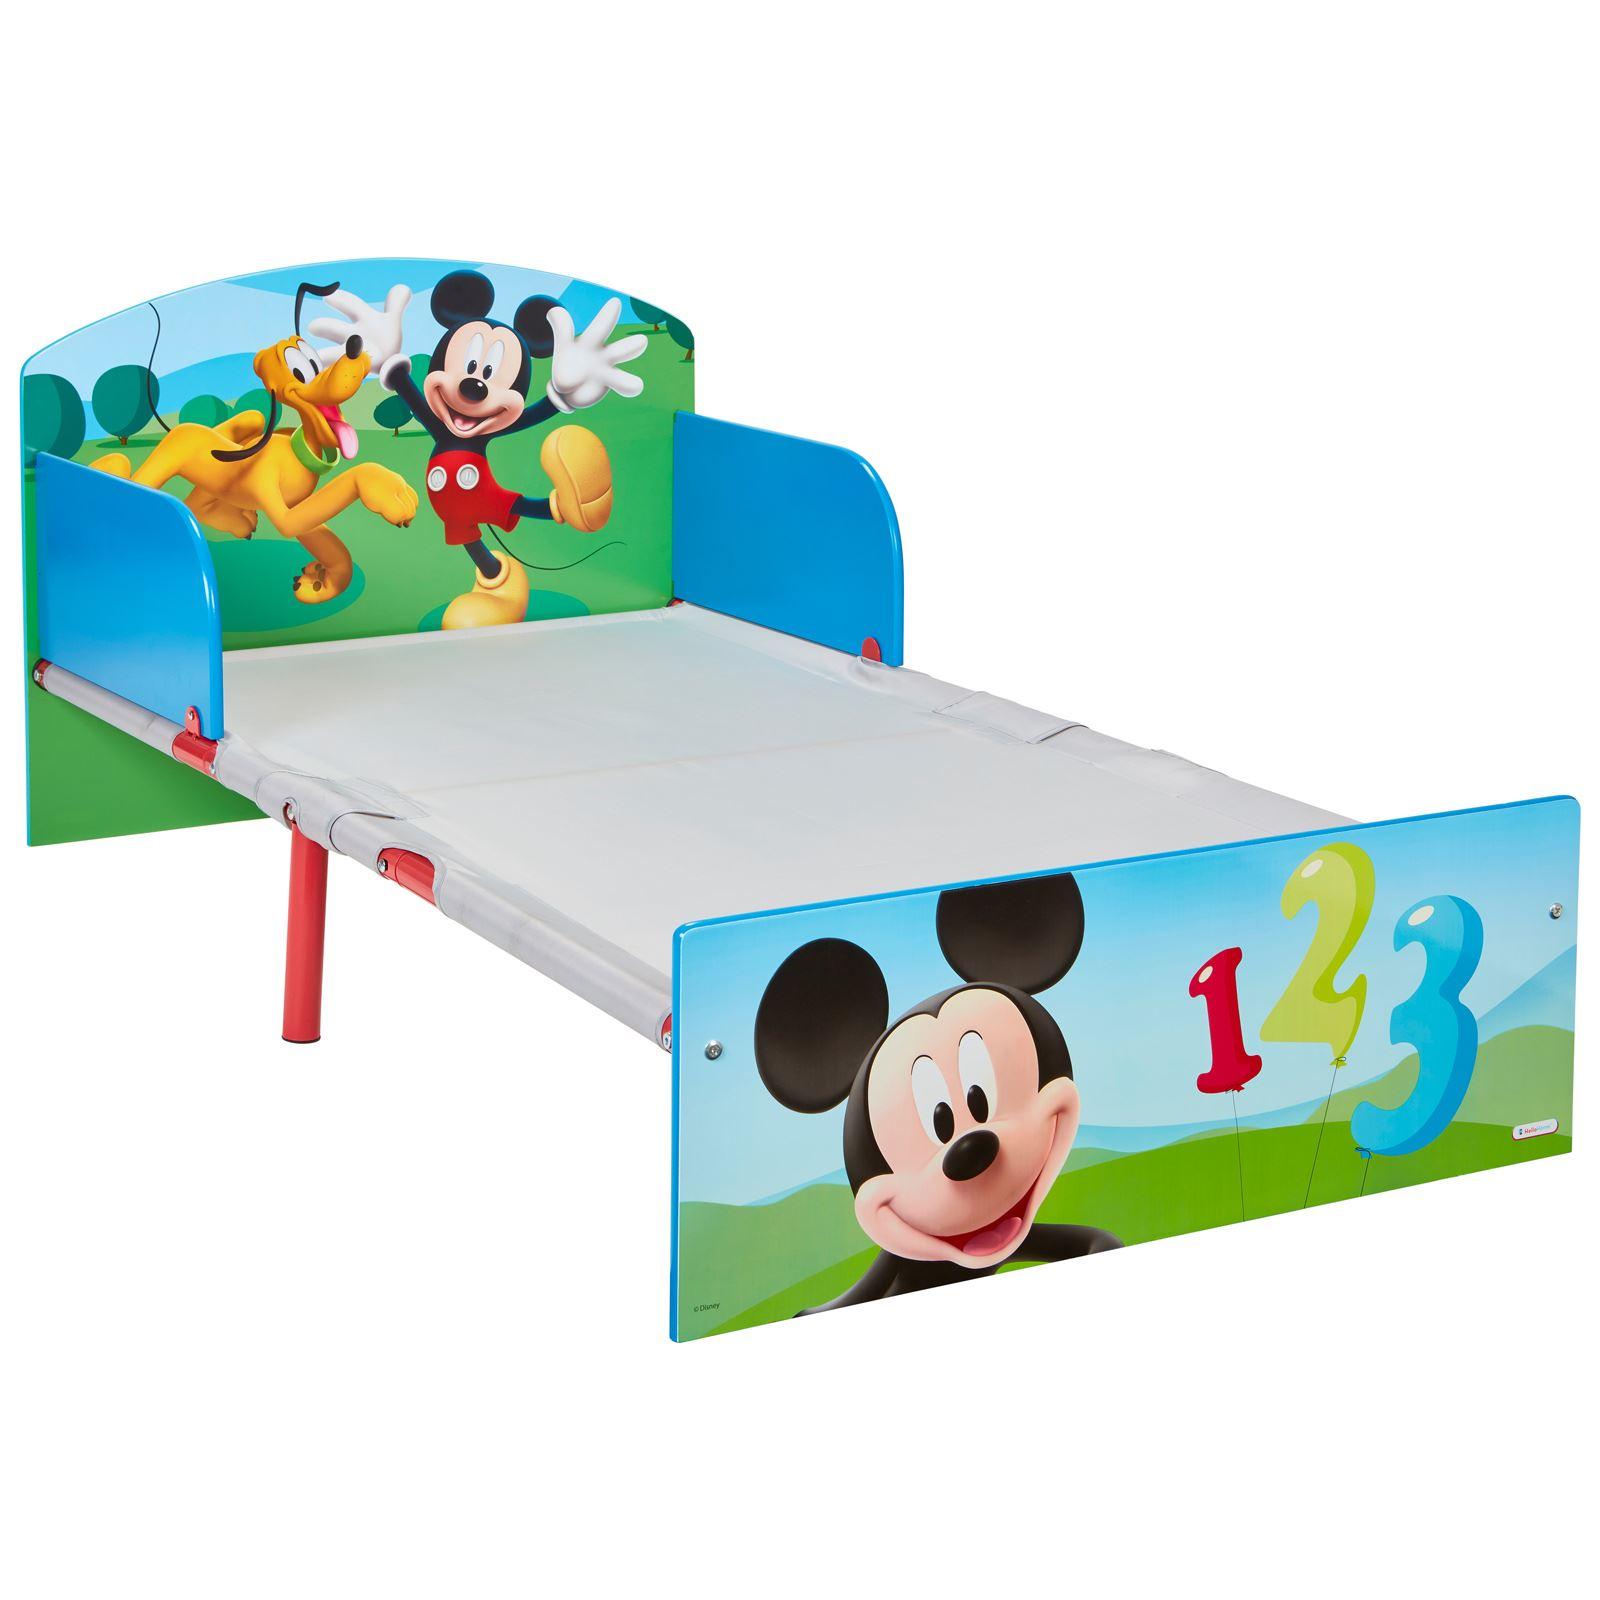 miniatura 22 - KIDS CHARACTER TODDLER BEDS - BOYS GIRLS BEDROOM DISNEY